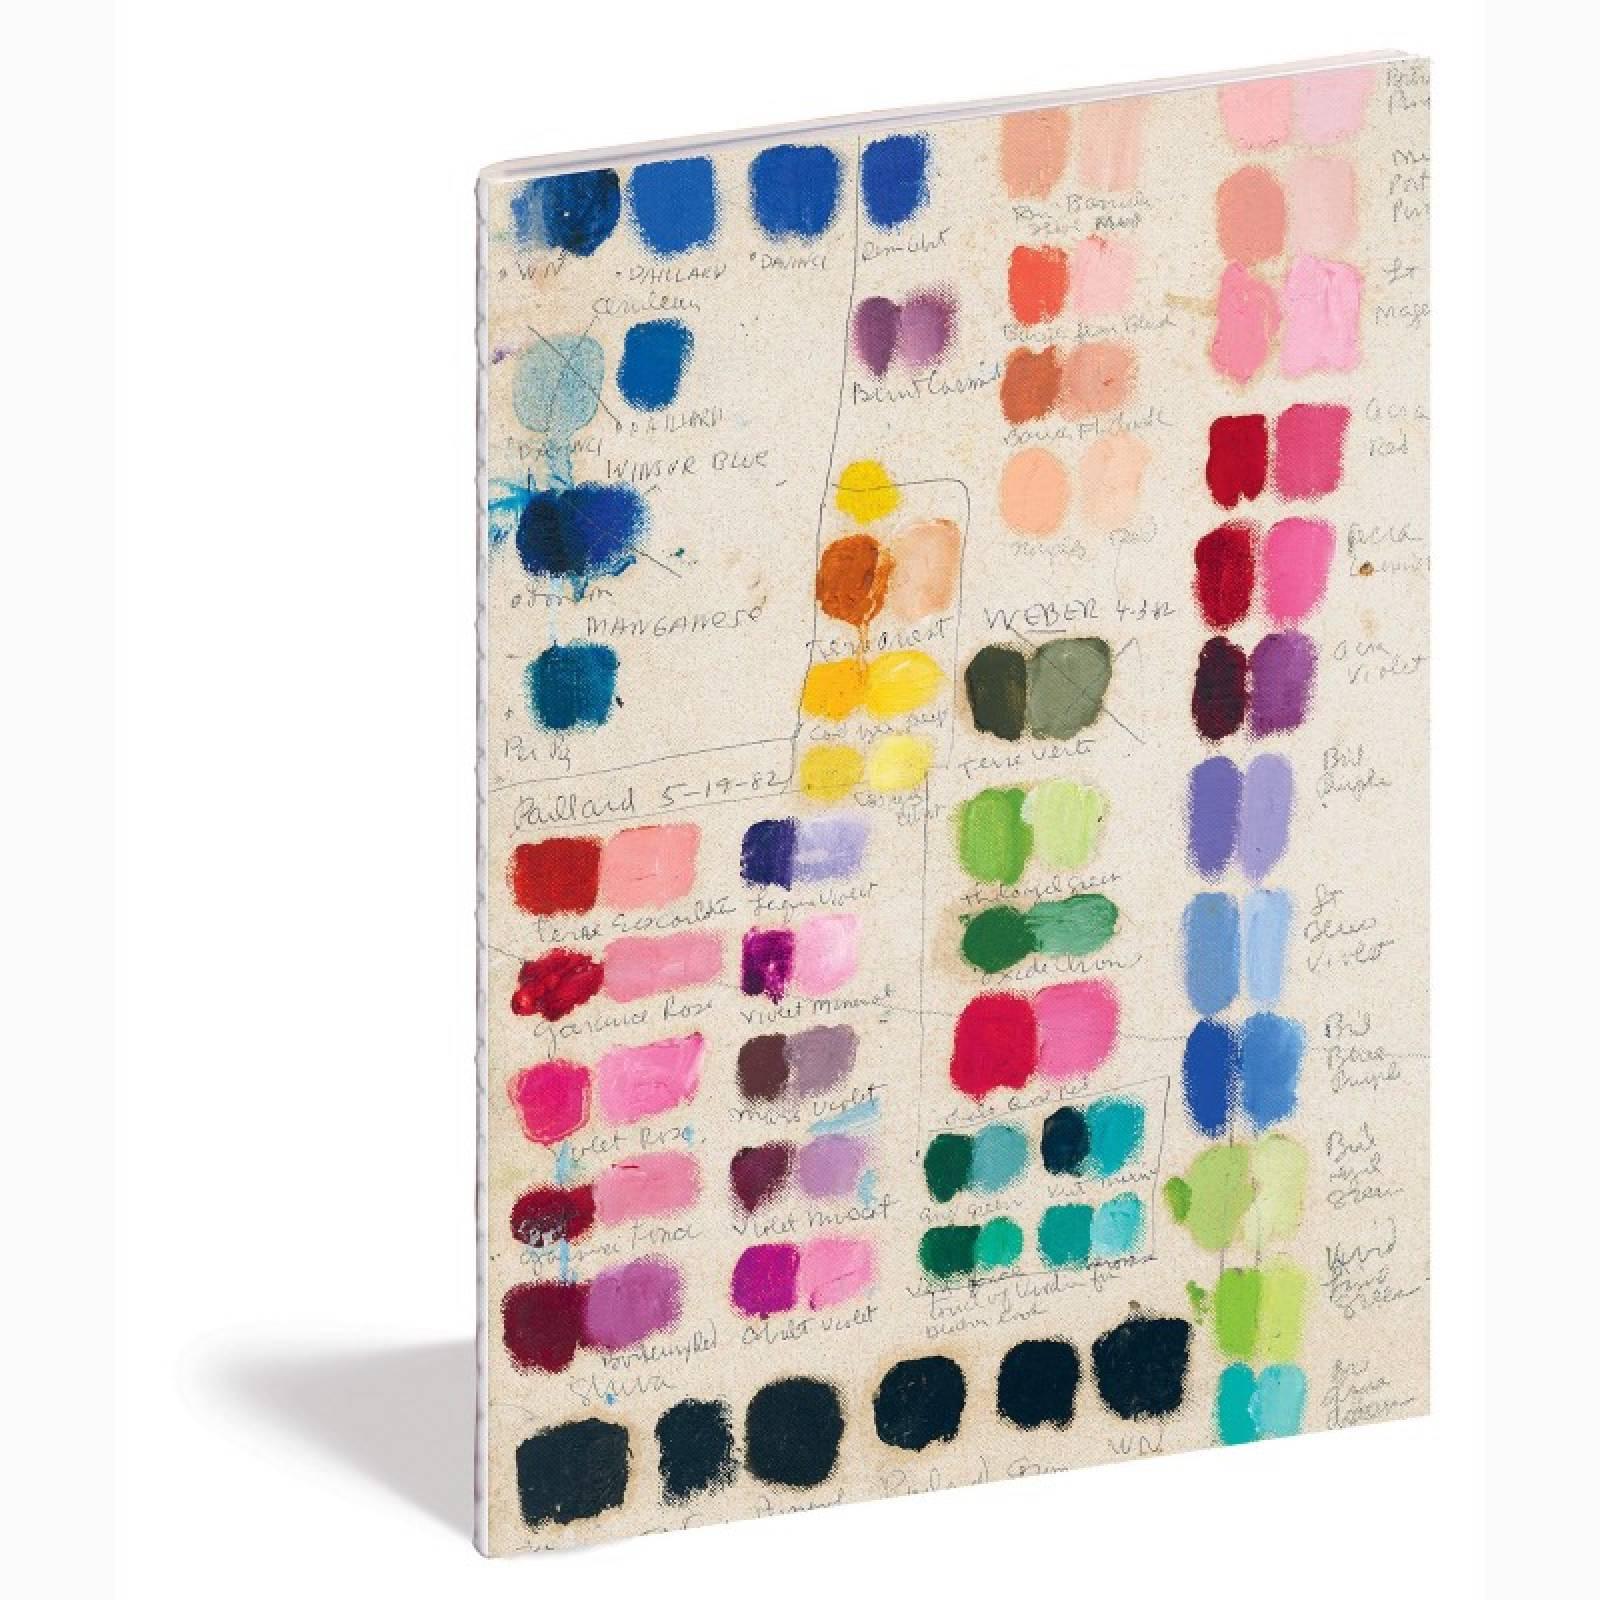 Colour Studies By John Derian - Set Of 3 Notebooks thumbnails